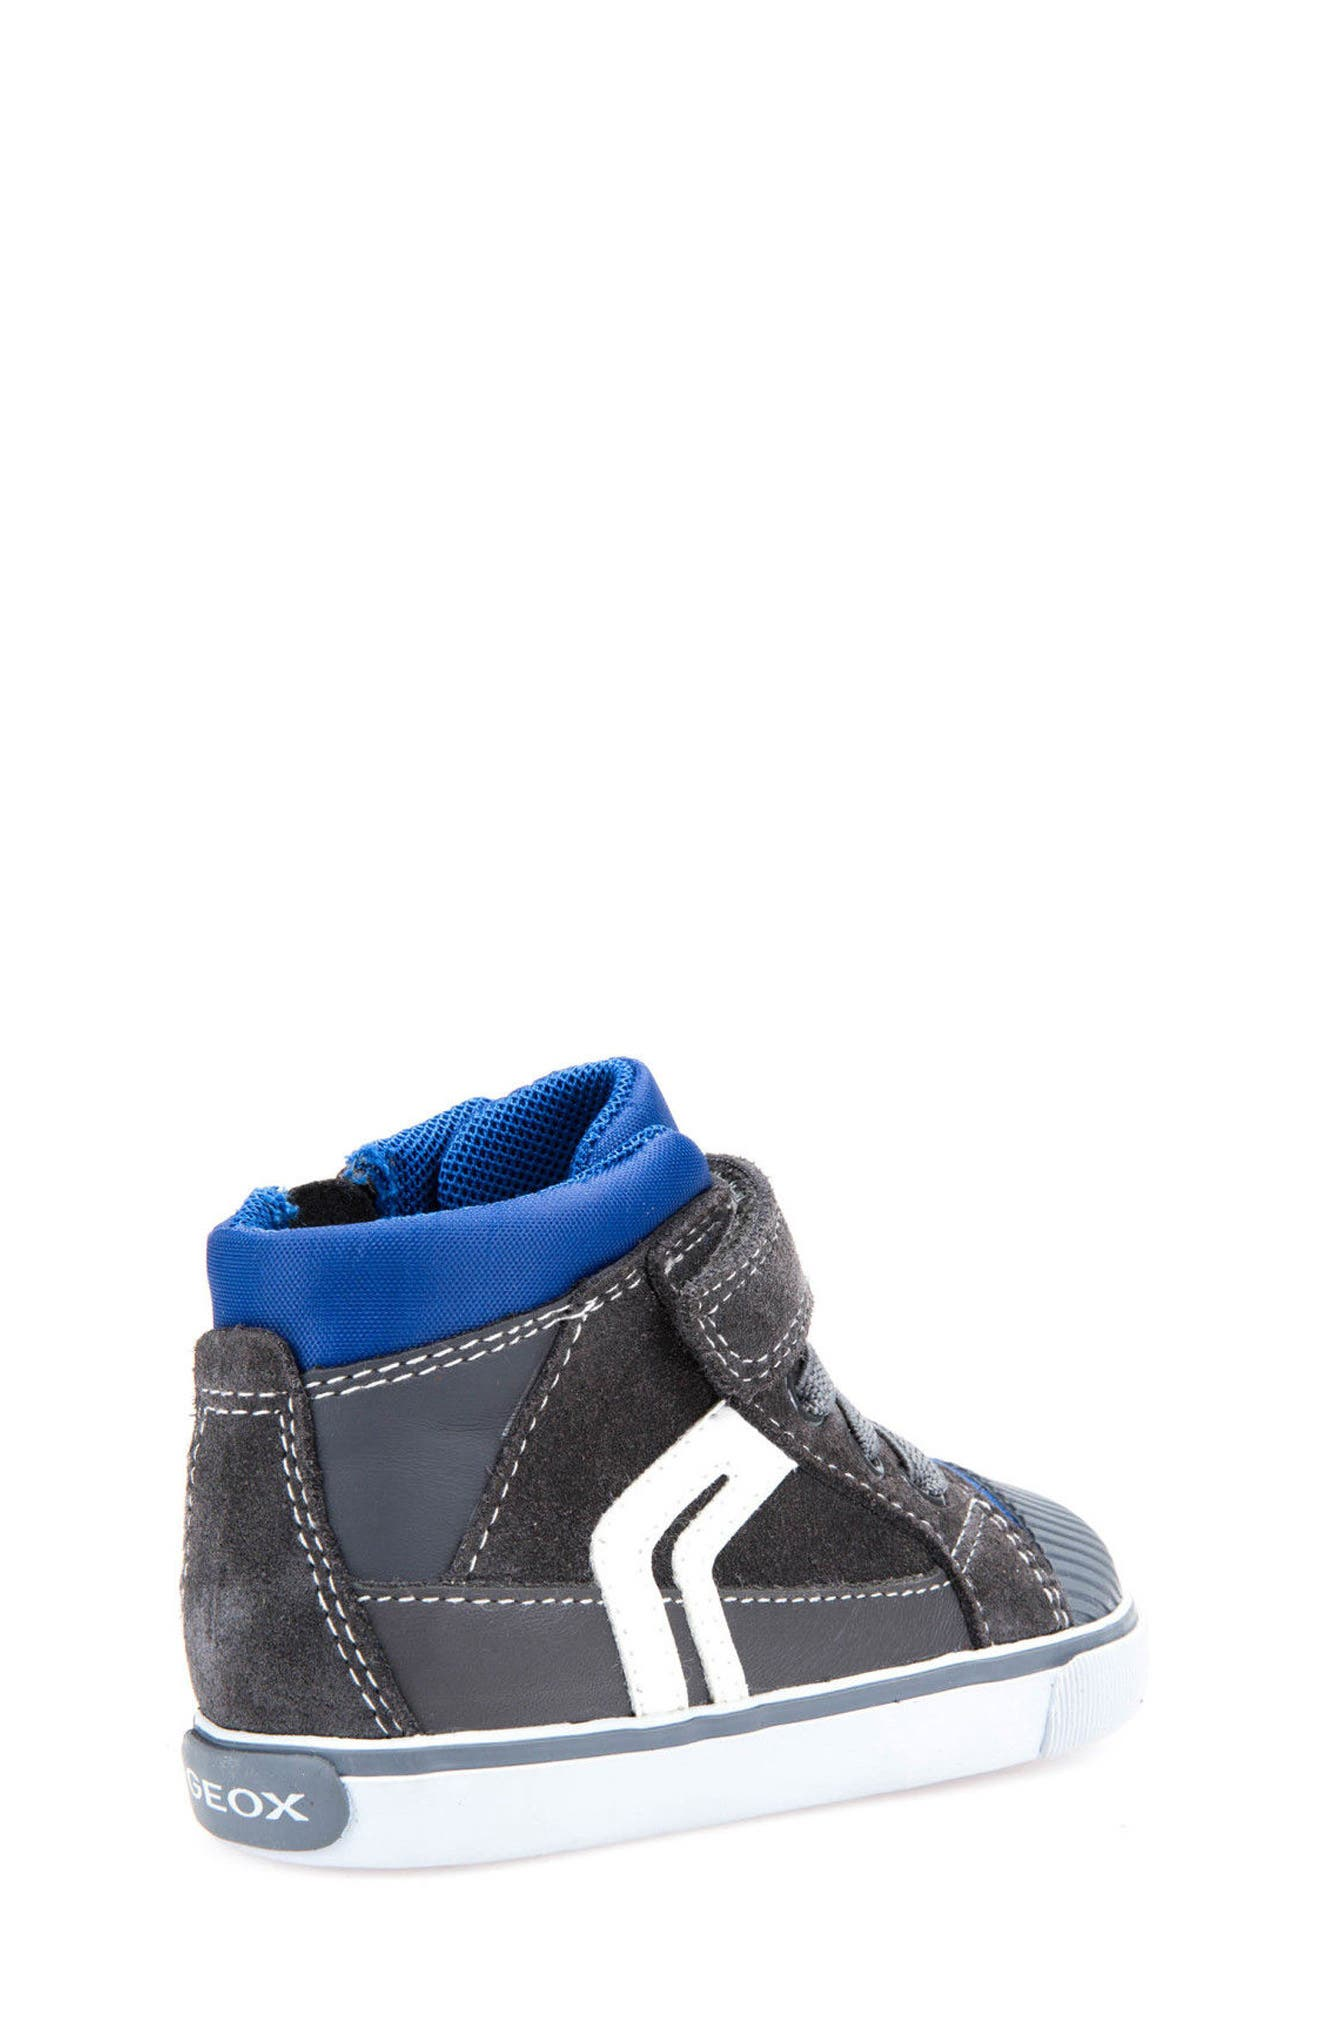 Kiwi Boy High Top Sneaker,                             Alternate thumbnail 2, color,                             073